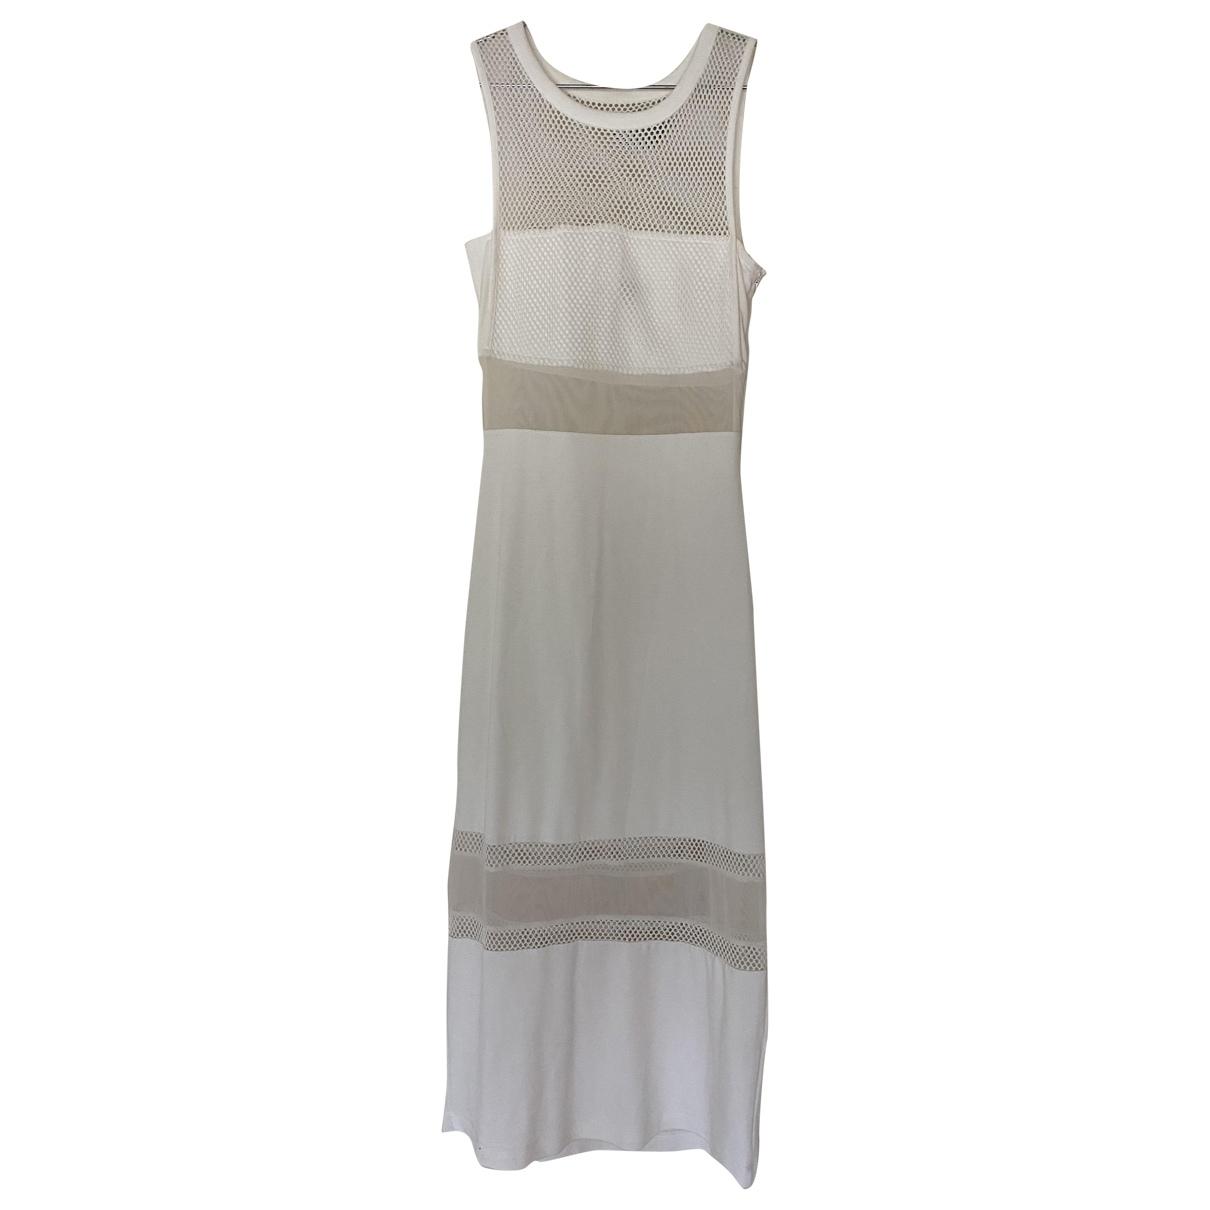 French Connection - Robe   pour femme en coton - elasthane - blanc